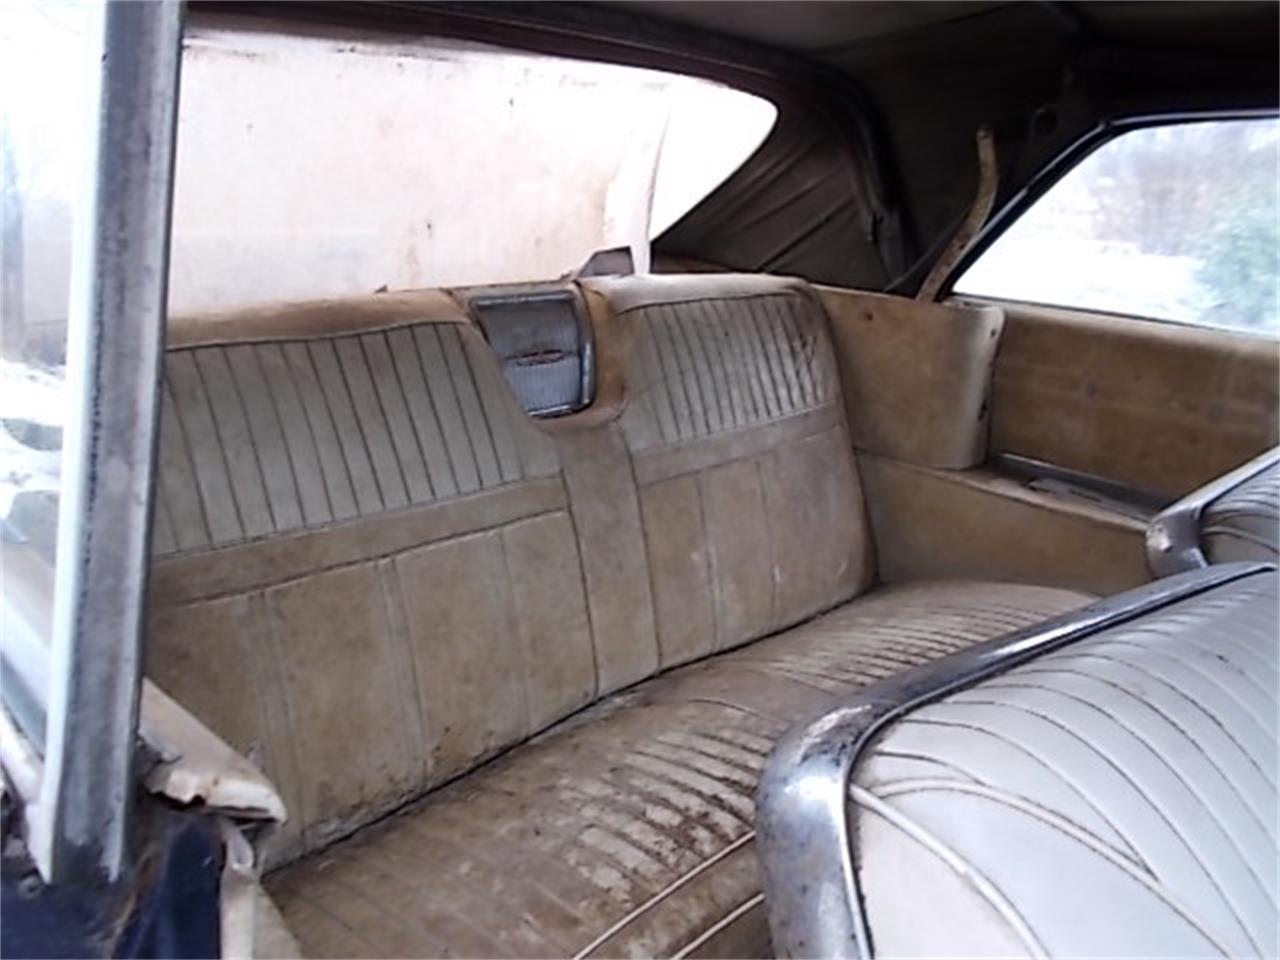 Large Picture of Classic 1963 98 located in Creston Ohio - $2,000.00 - JZD5